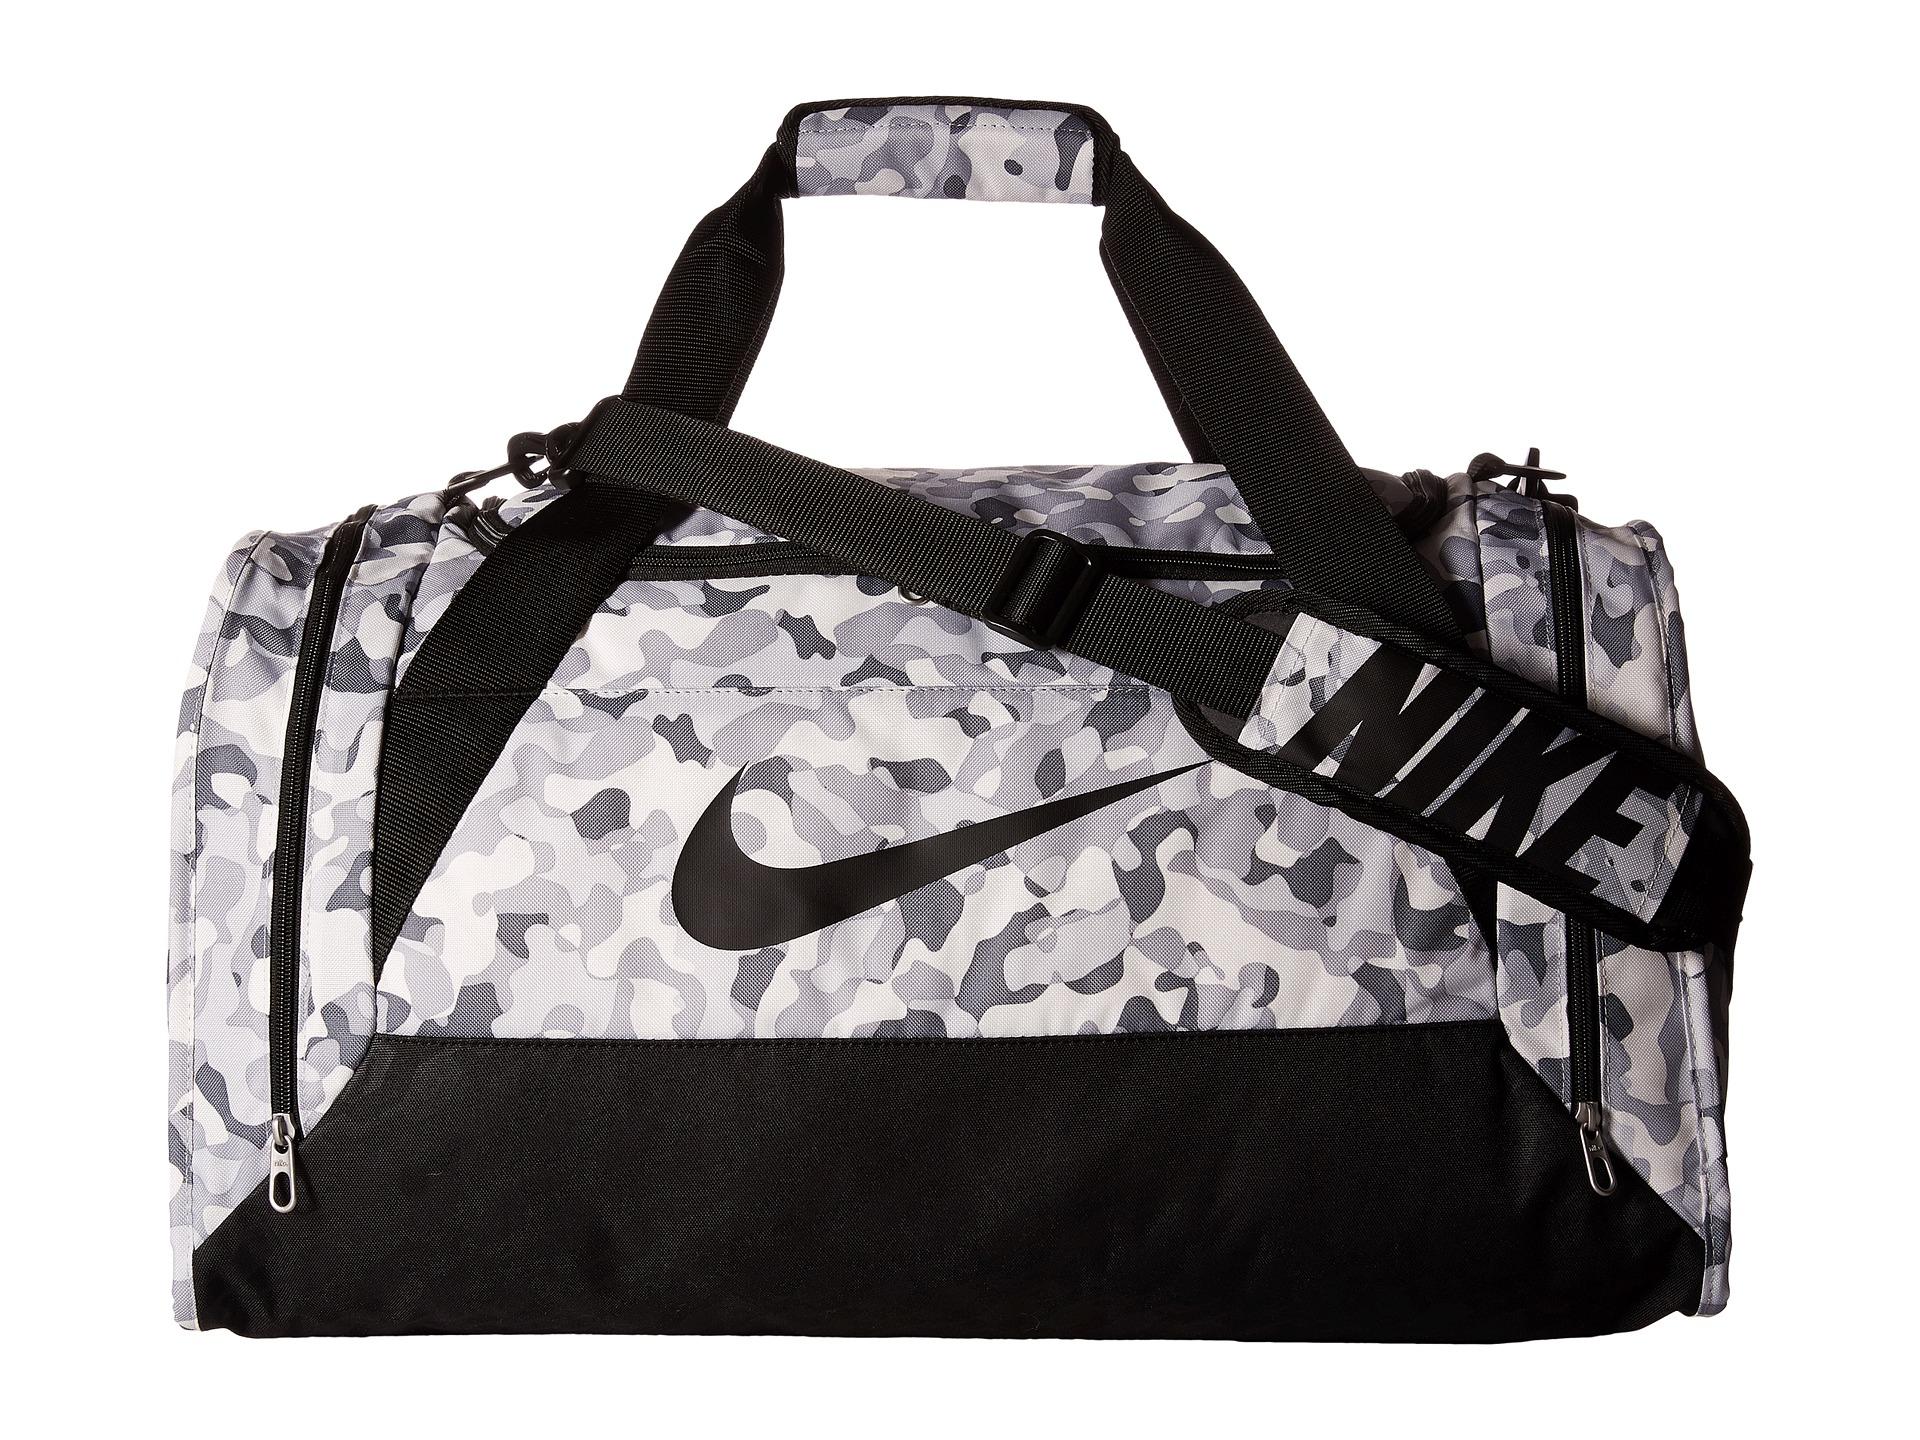 ce2319dca2f5 Lyst - Nike Brasilia 6 Duffel Graphic Medium for Men